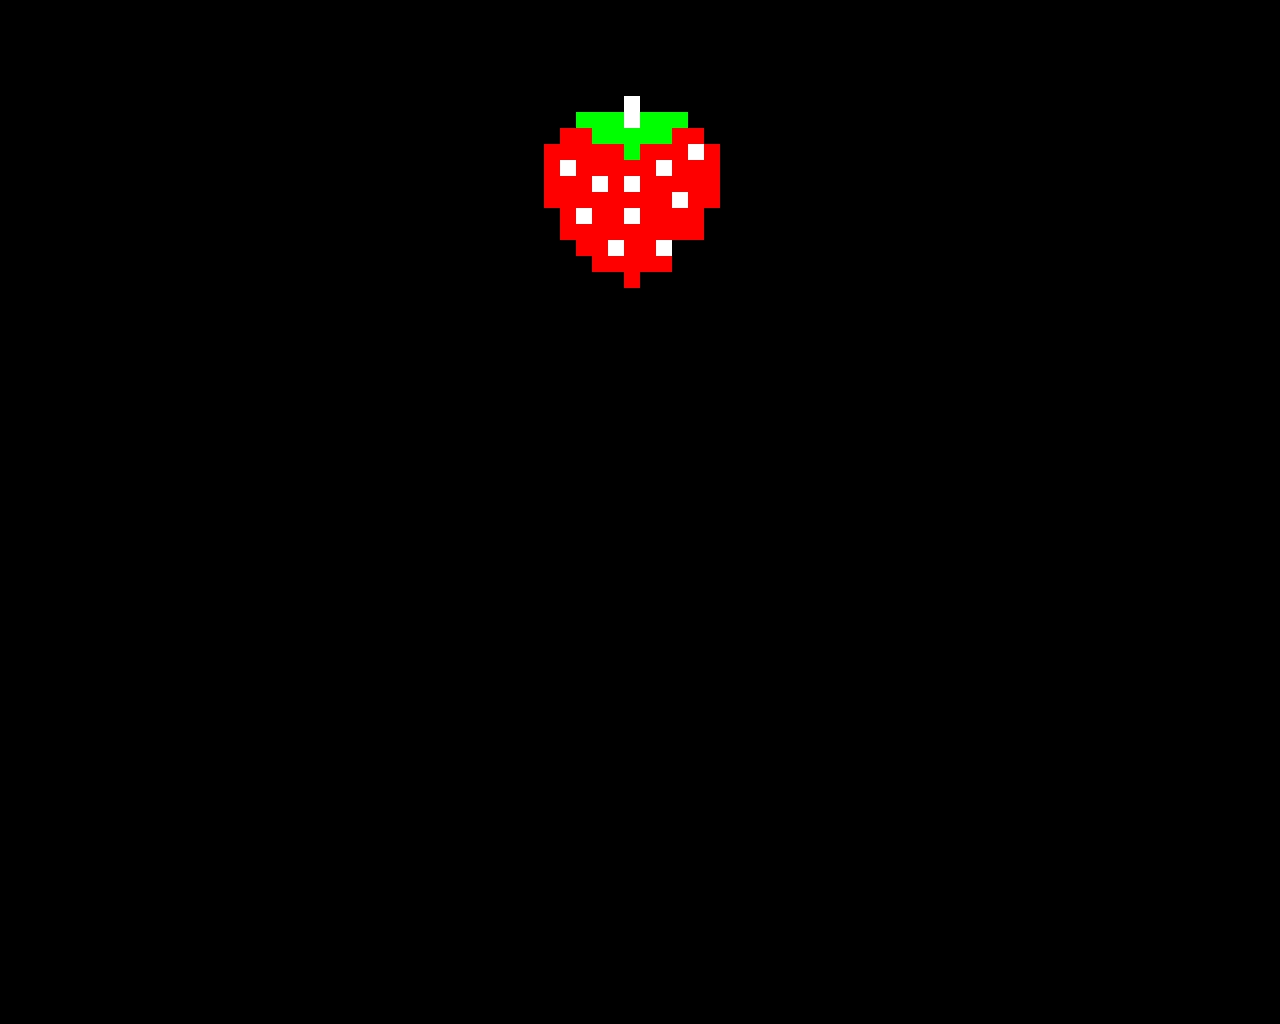 Strawberry pac man bonus item